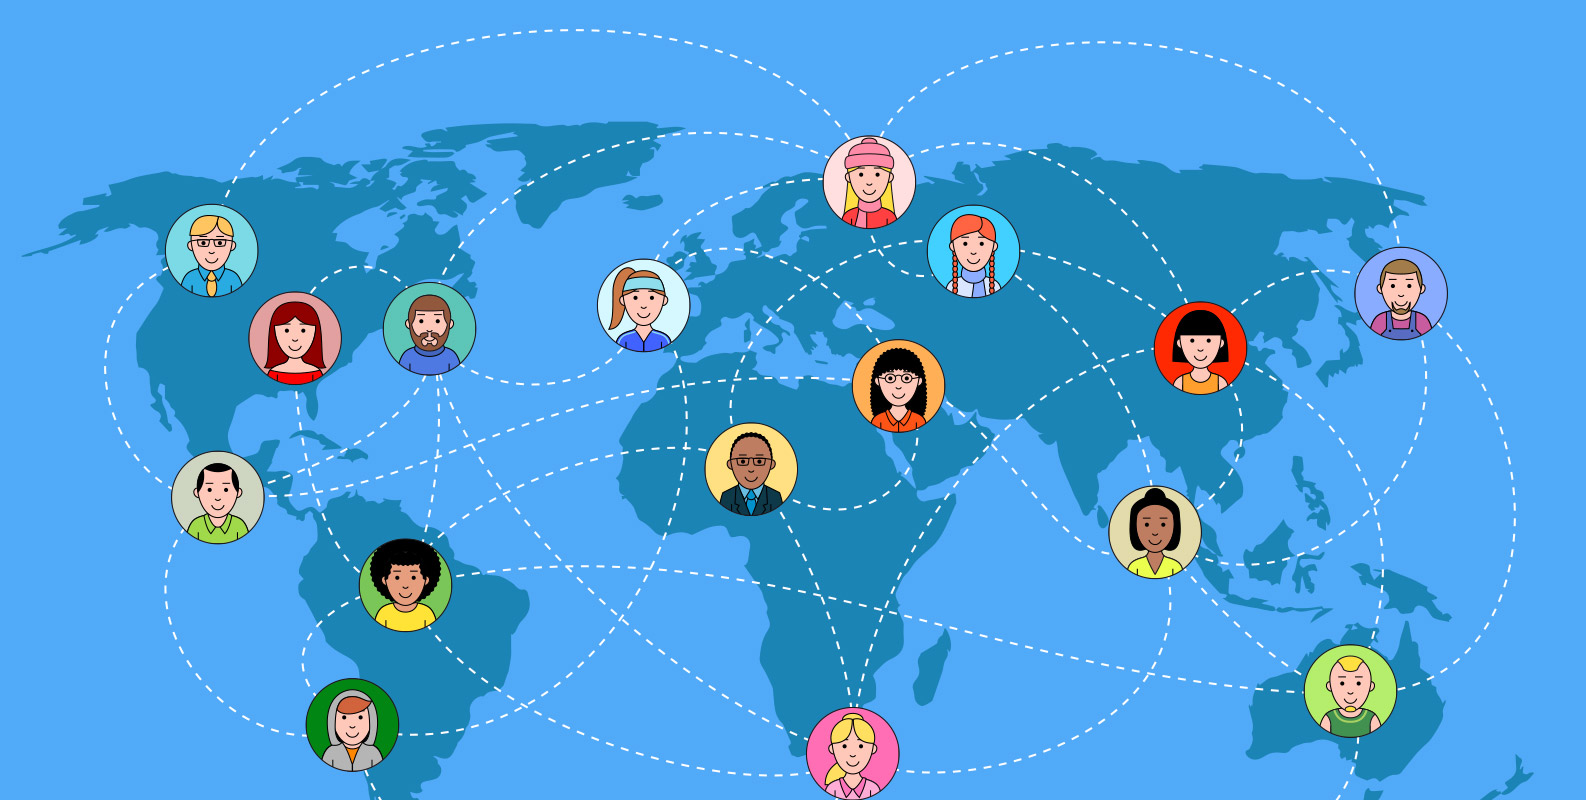 SaaS Marketing Globalization